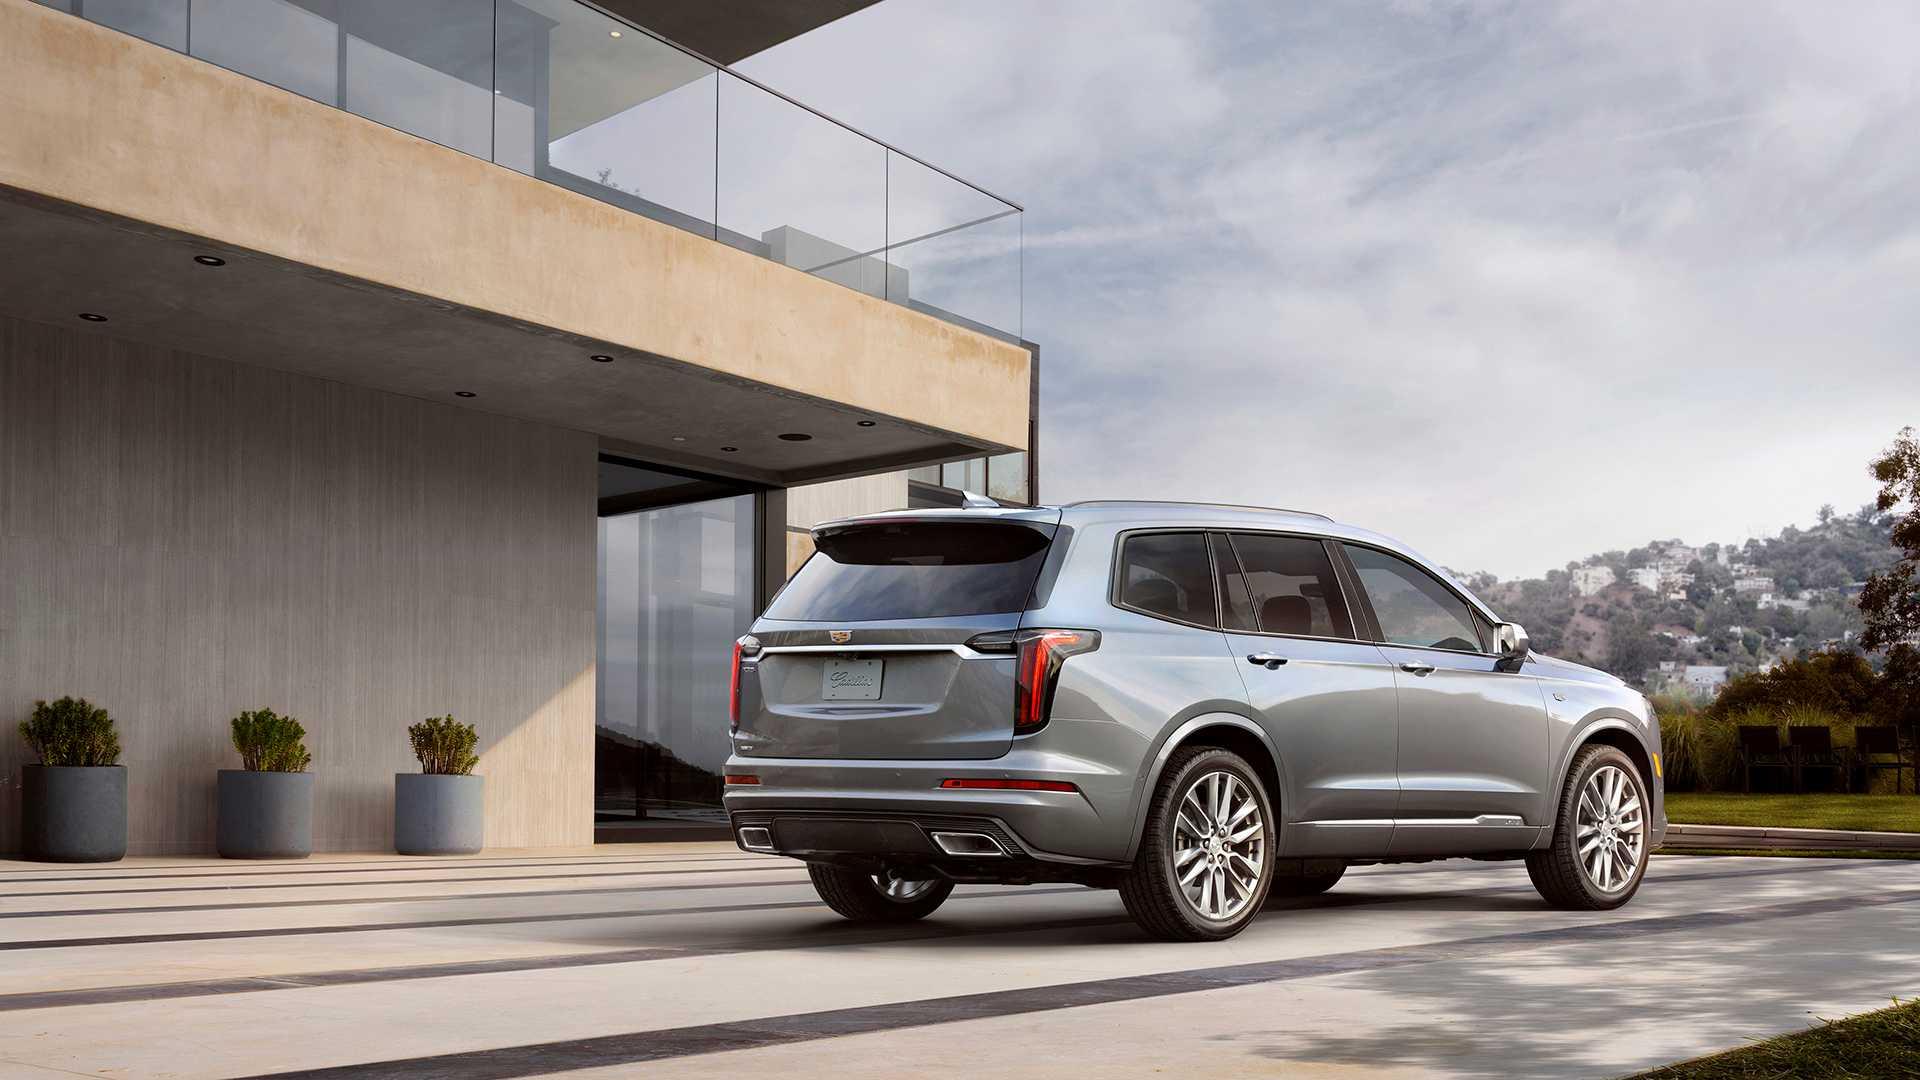 2020 Cadillac Xt6 Criticized Over Poor Build Quality Subpar